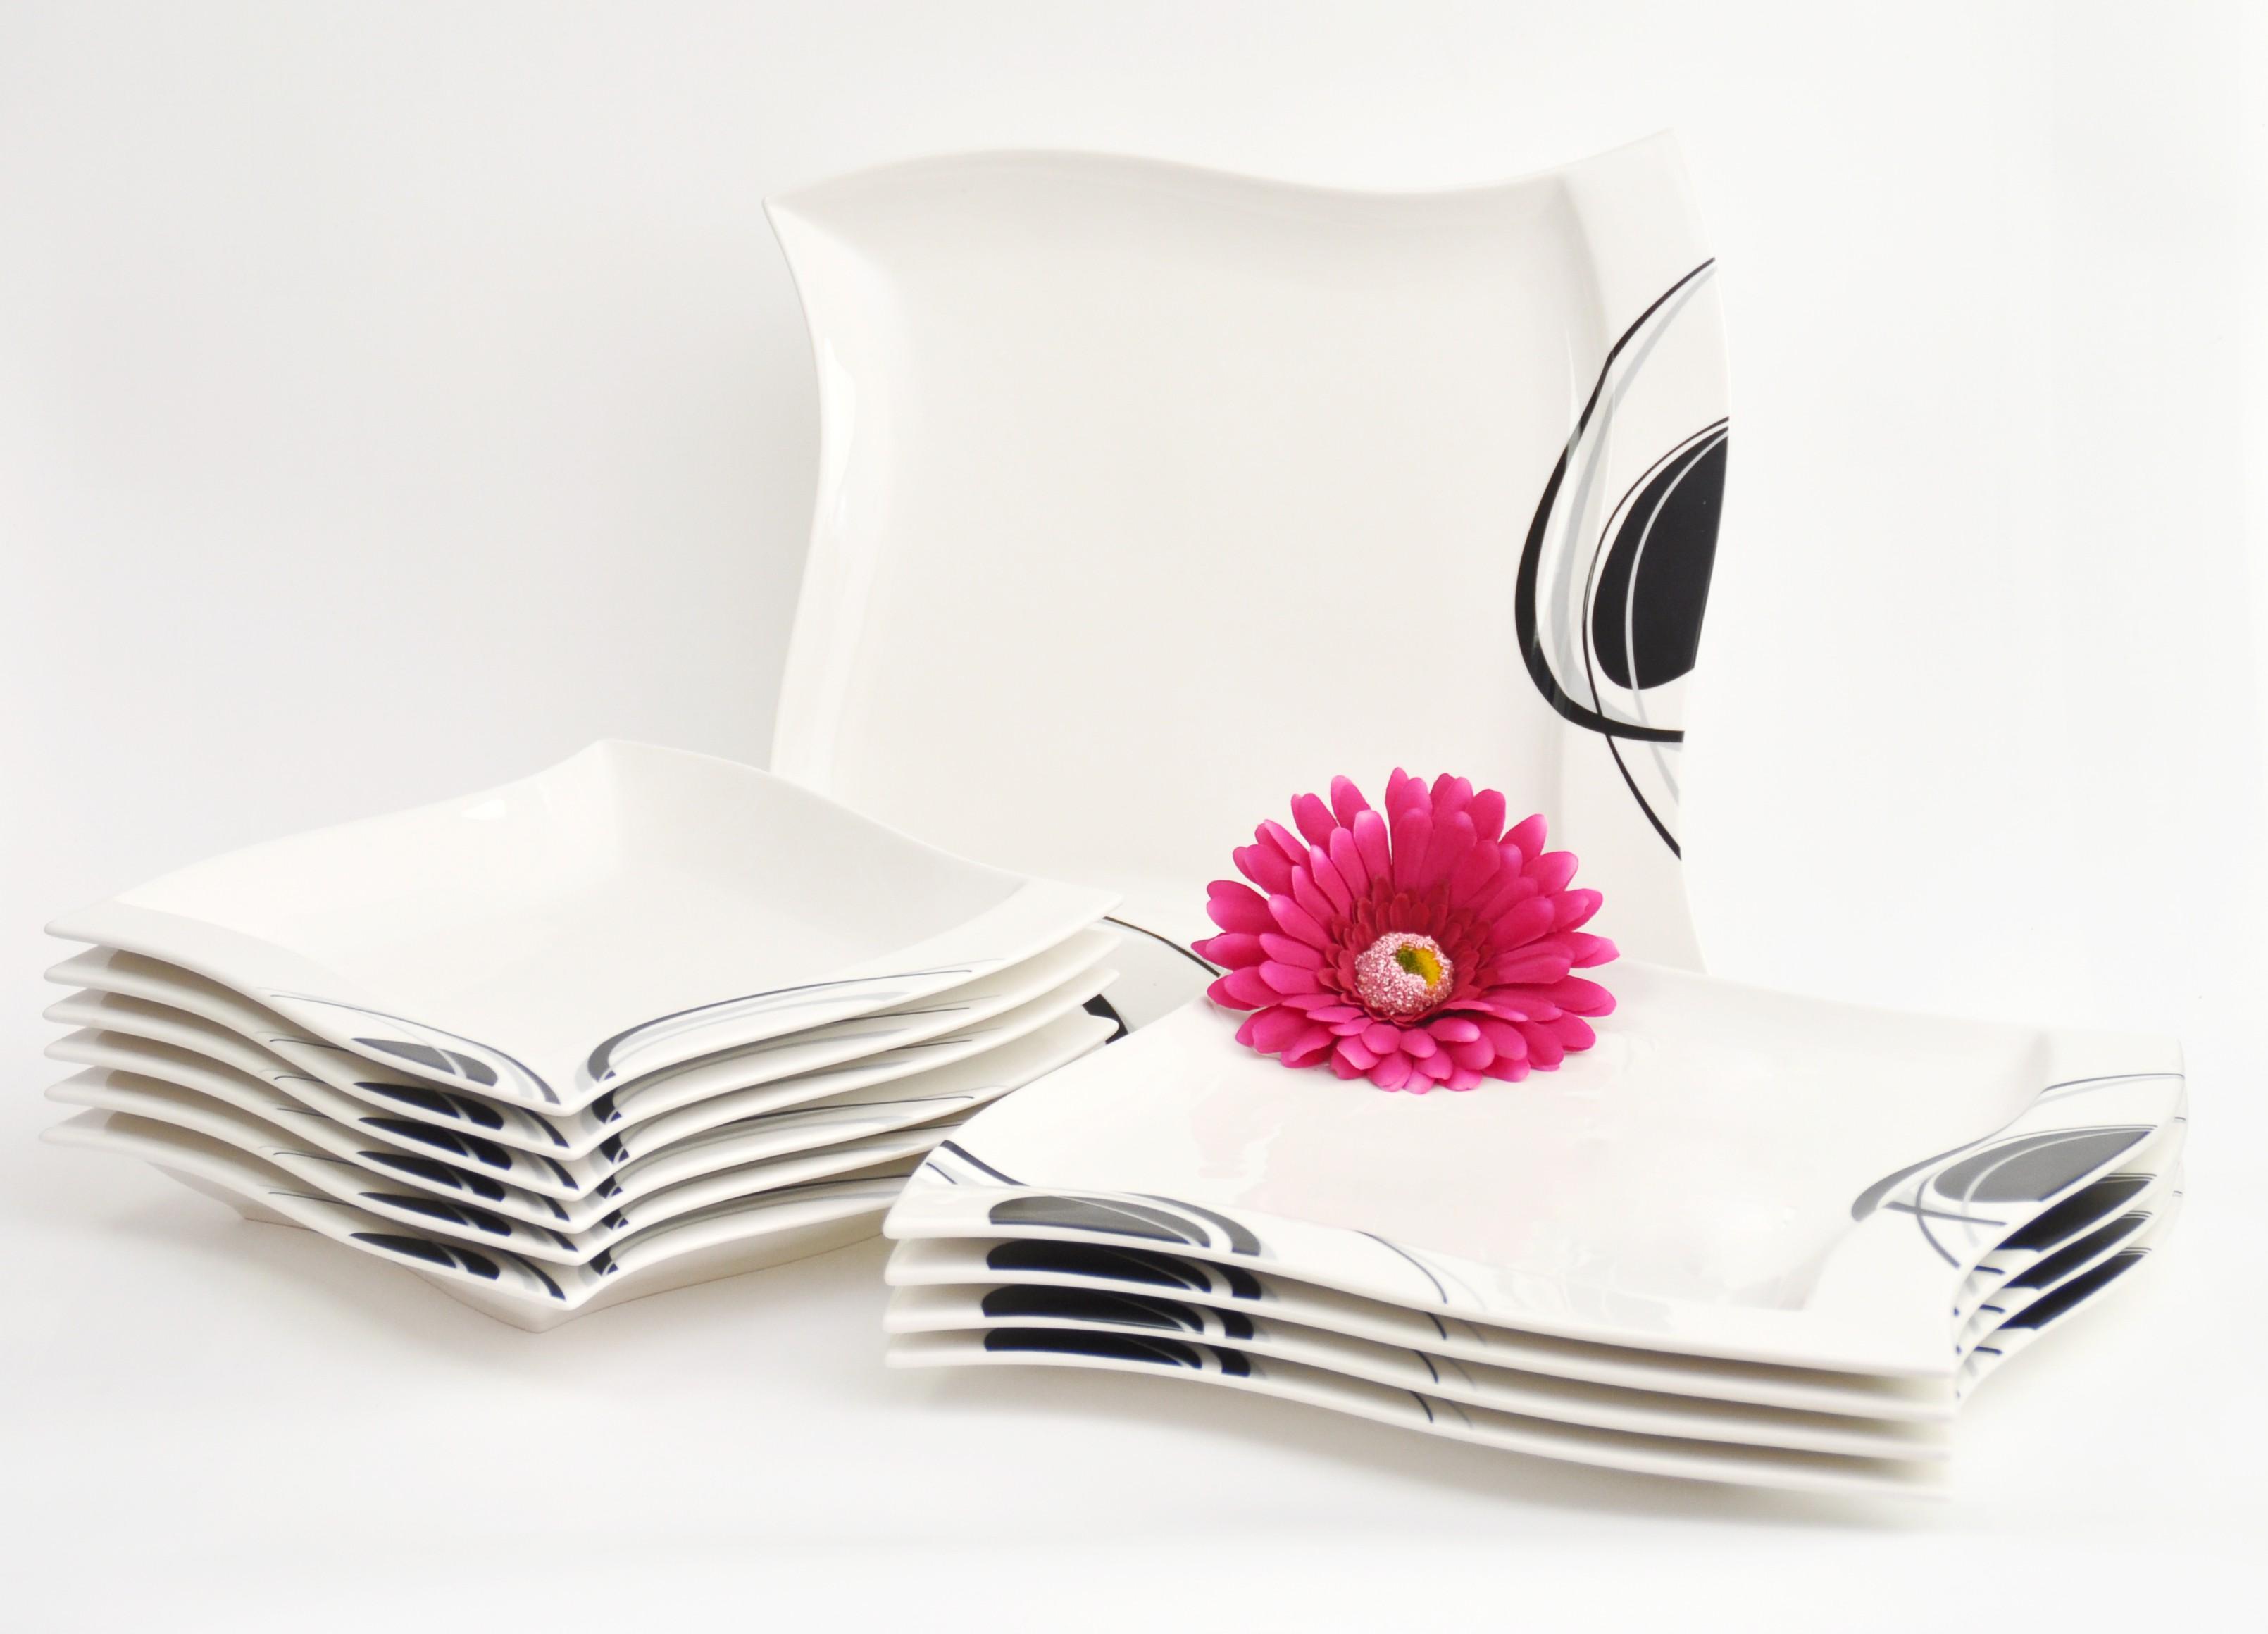 tafelservice scarlett 12 teilig eckig porzellan f r 6 personen wei mit schwarzem dekor. Black Bedroom Furniture Sets. Home Design Ideas